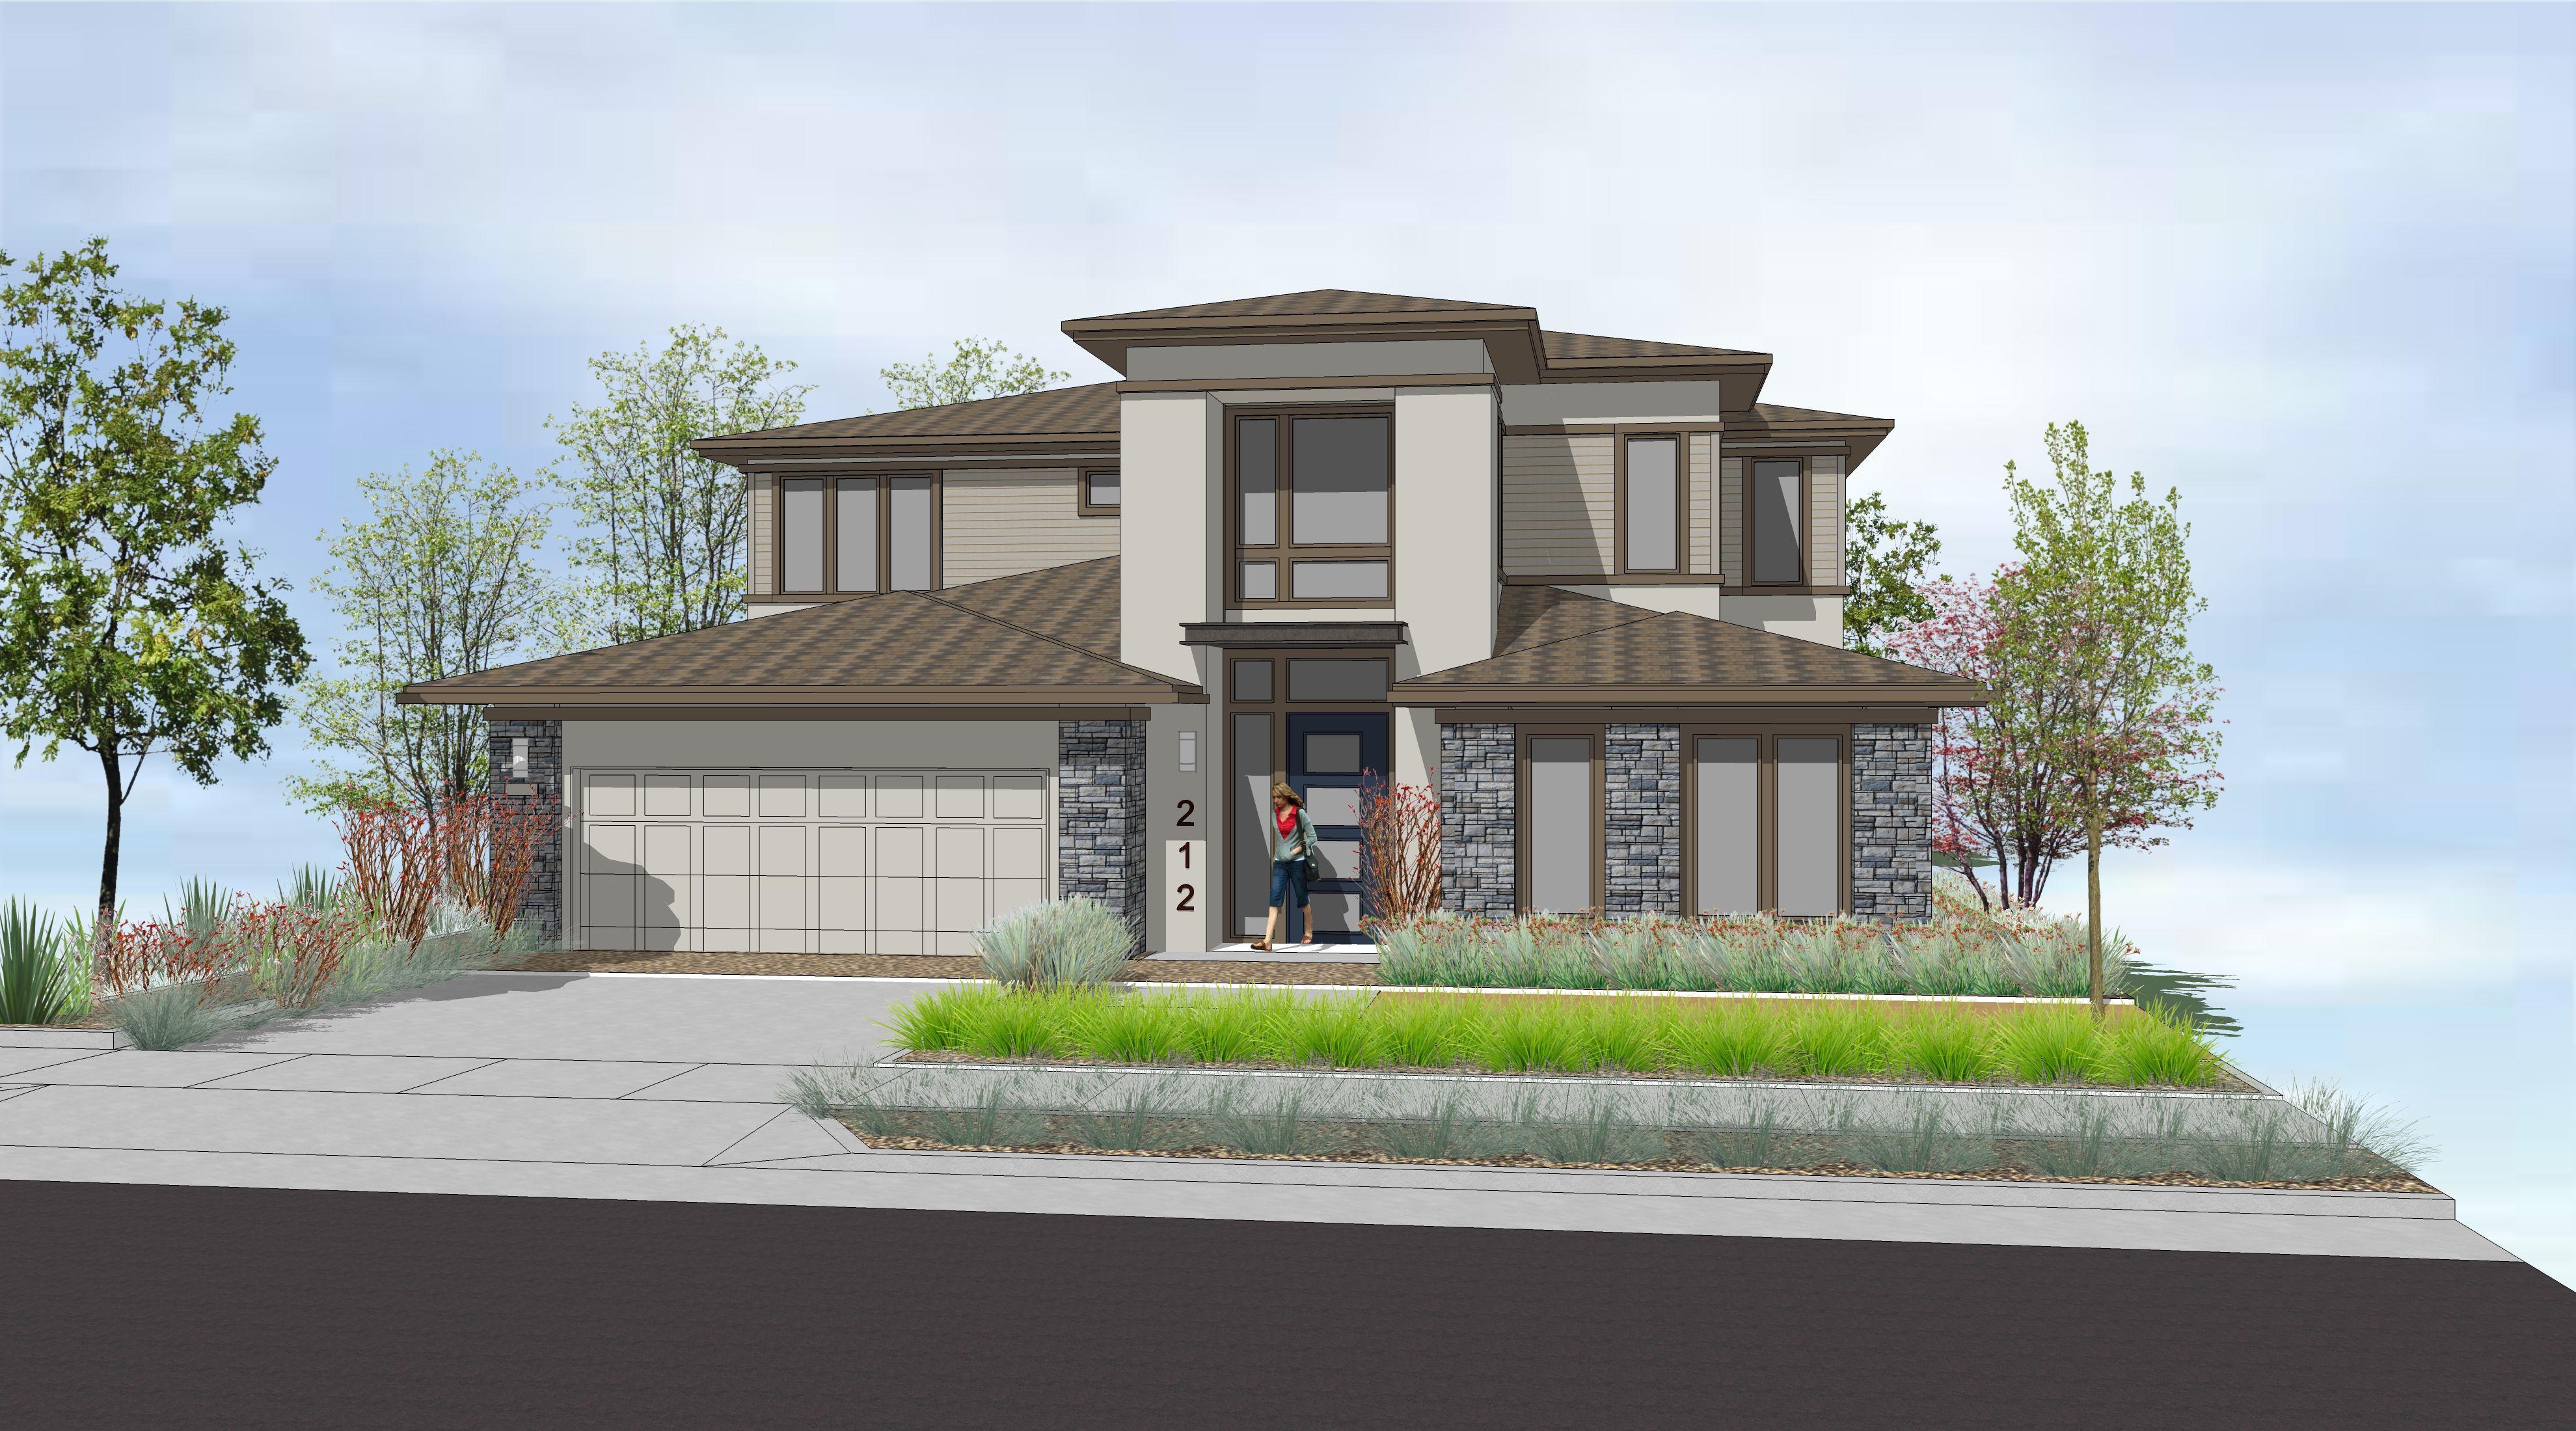 Single Family for Sale at Cresleigh Peaks - Signature - Denali 2737 Satori Way Yuba City, California 95993 United States